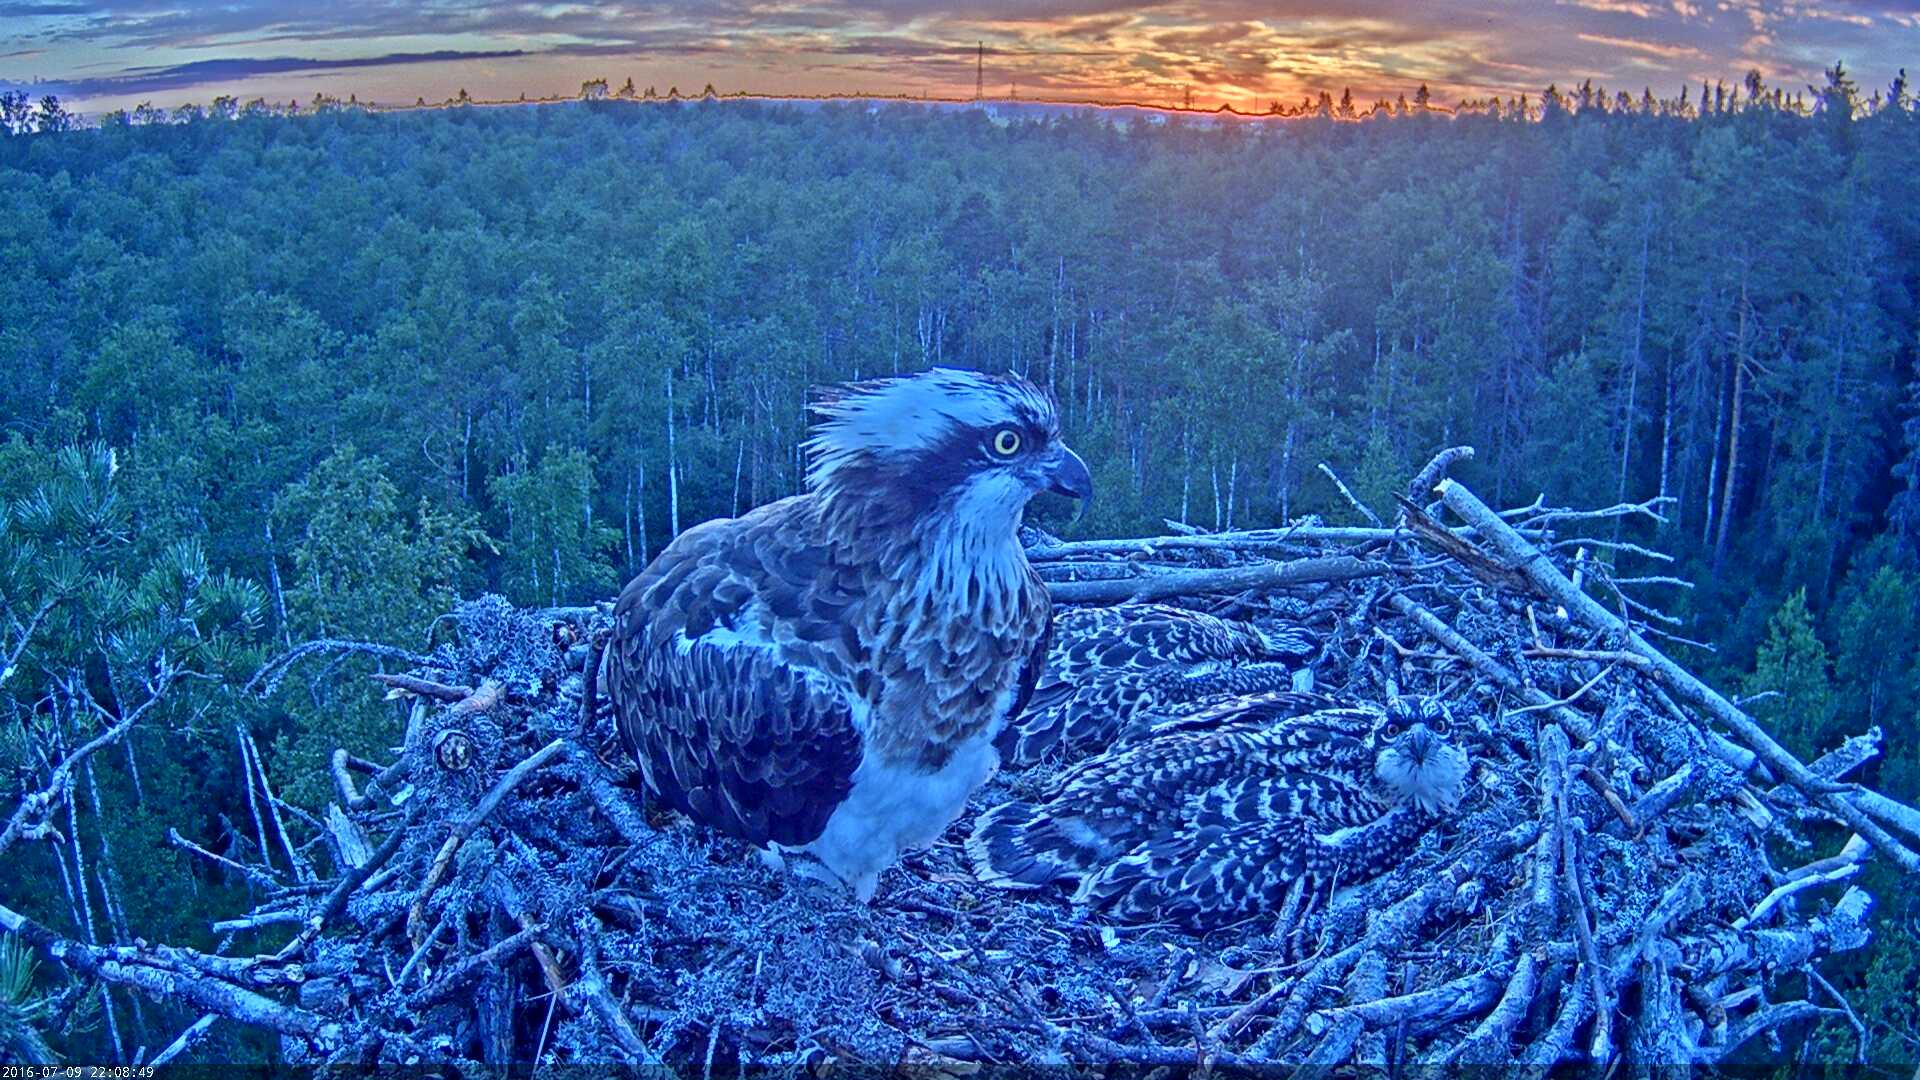 Estonian Osprey Nest Mai & Mati 2016 Kalakotkas-2016-07-09-22-08